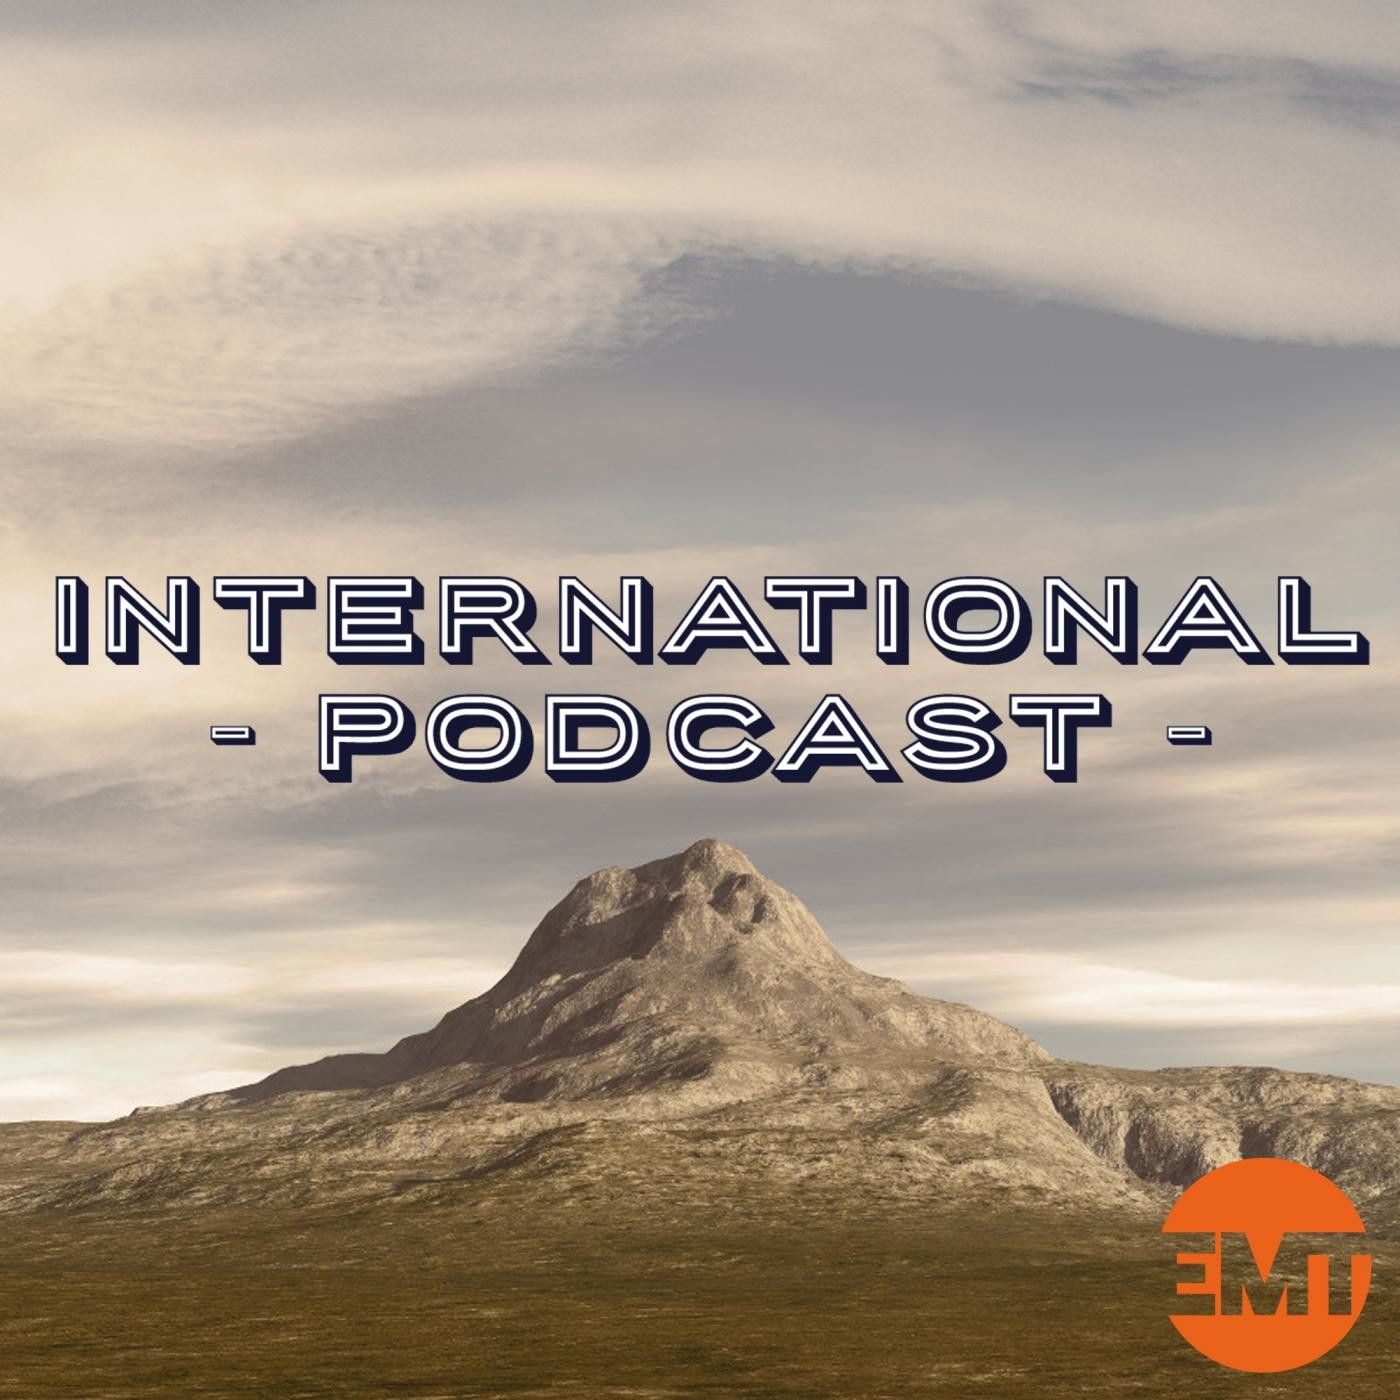 <![CDATA[International Podcast]]>